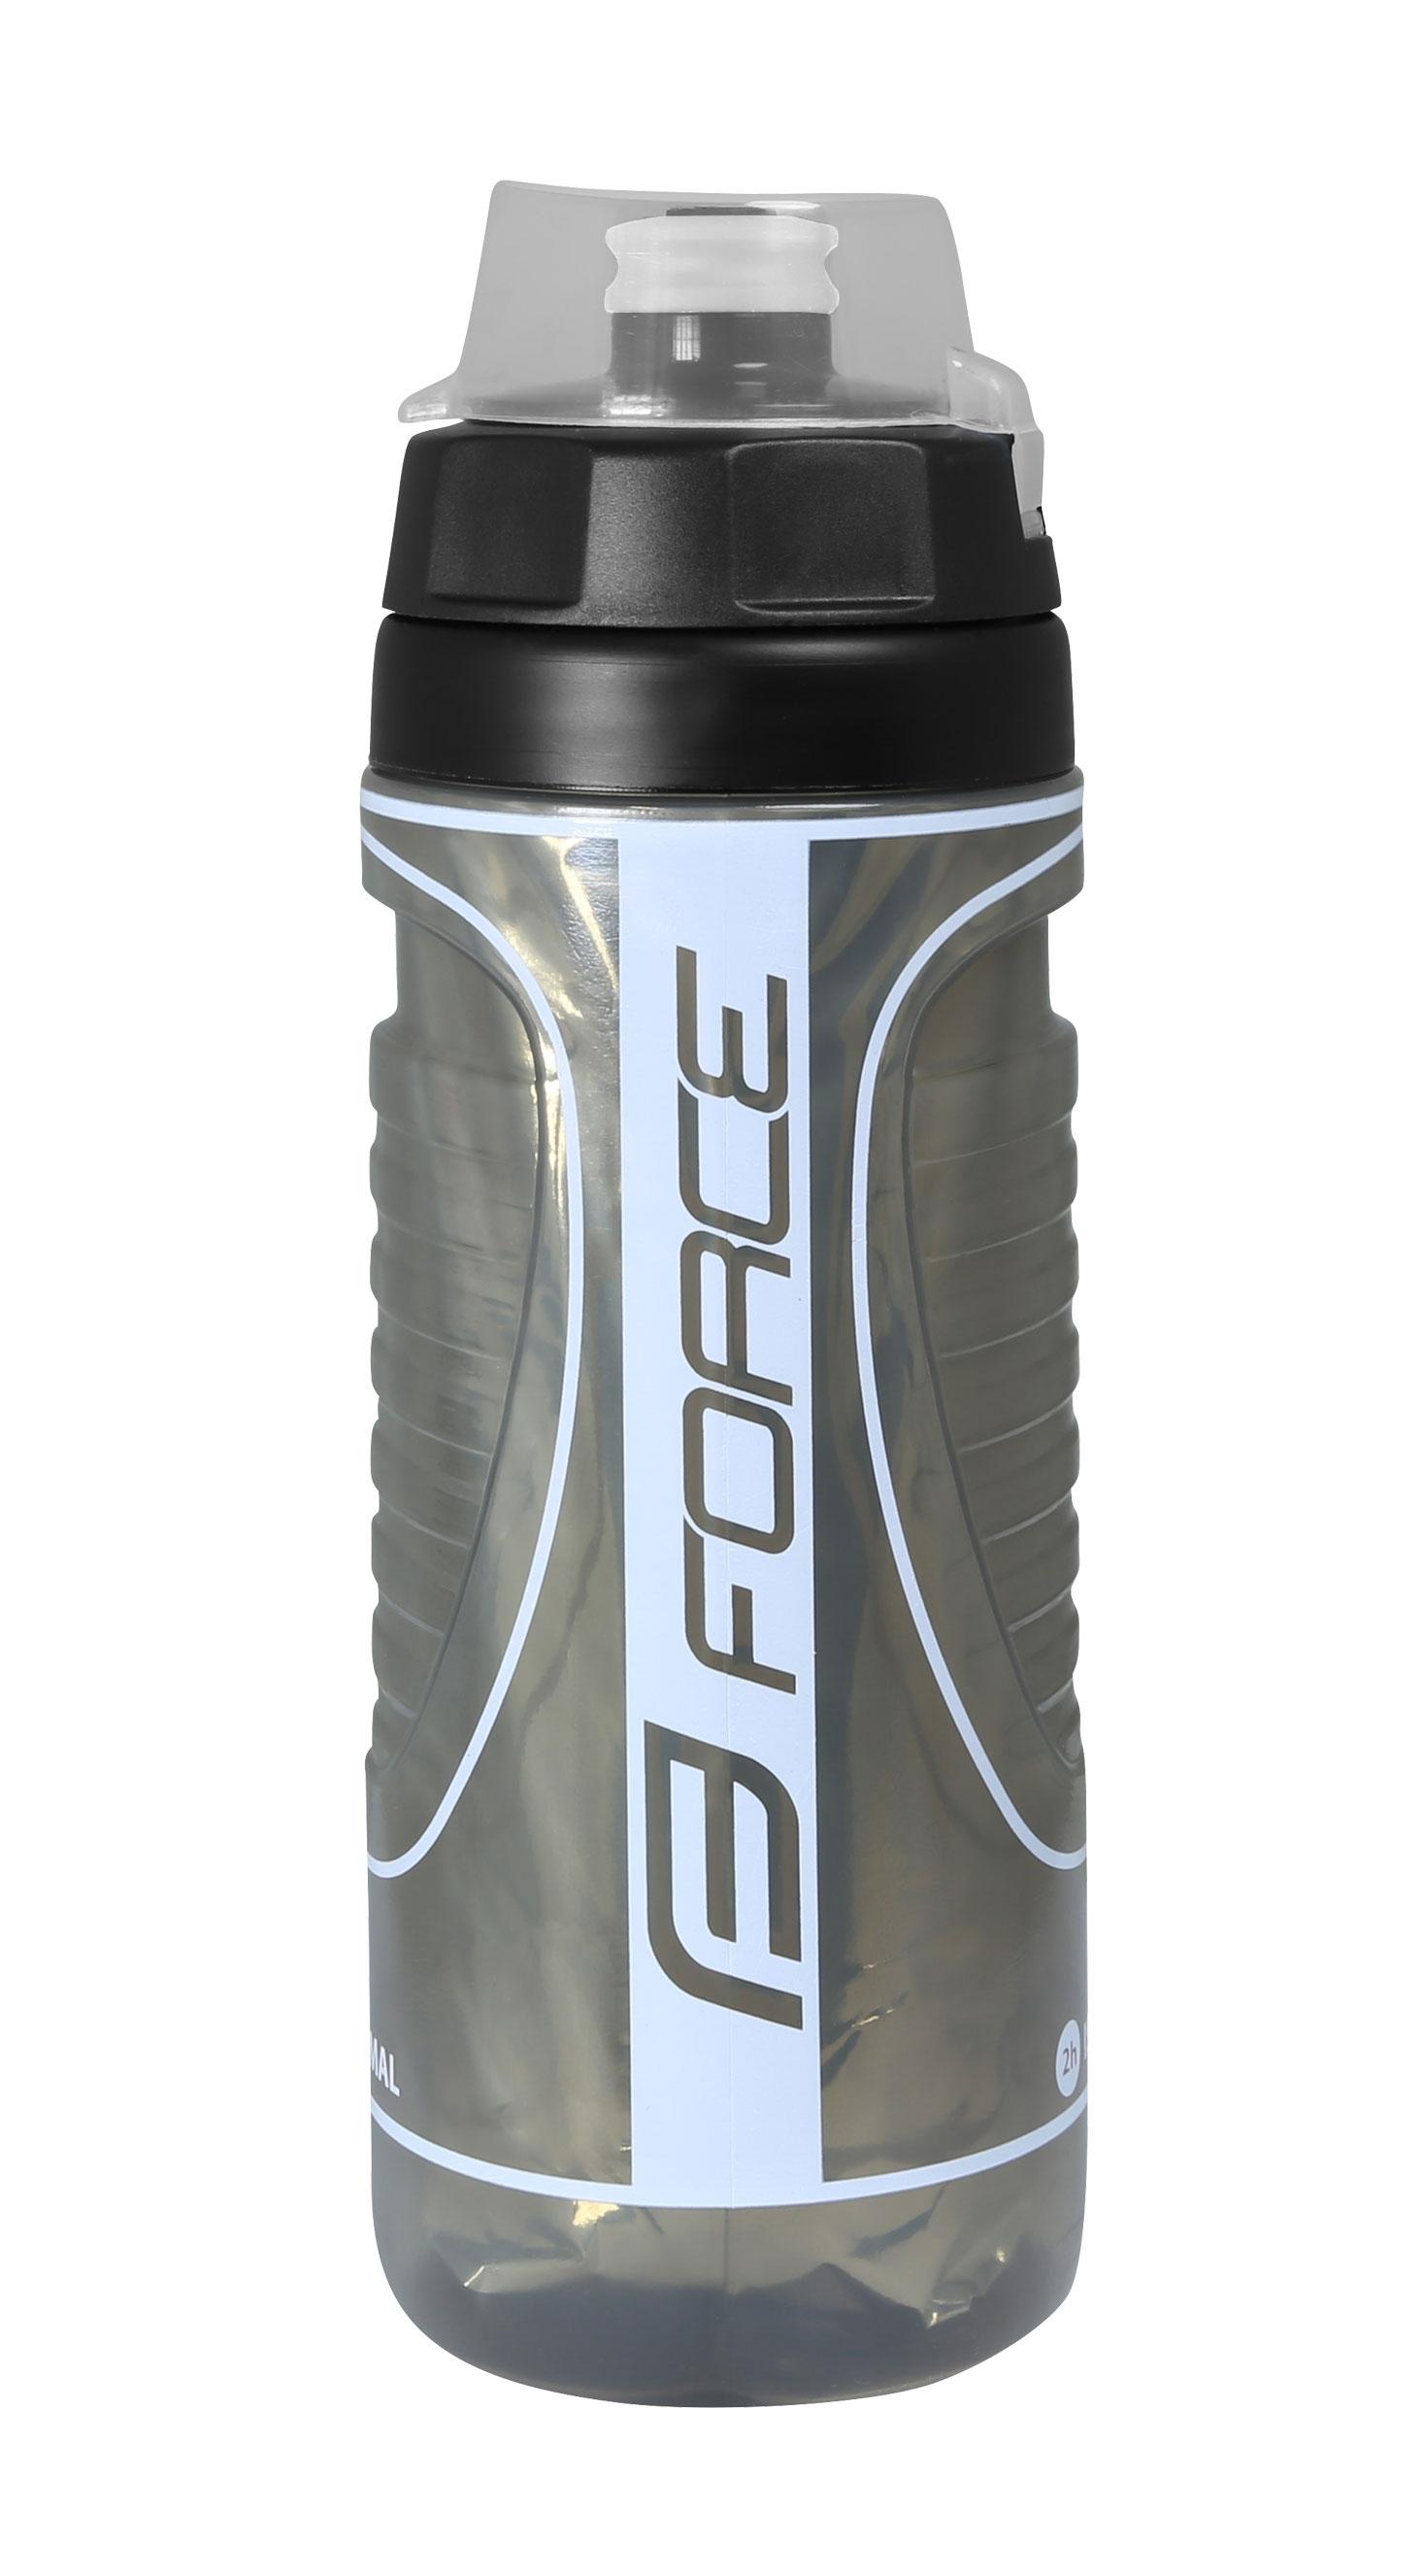 láhev FORCE HEAT 0,5 l termoláhev, černo-šedá